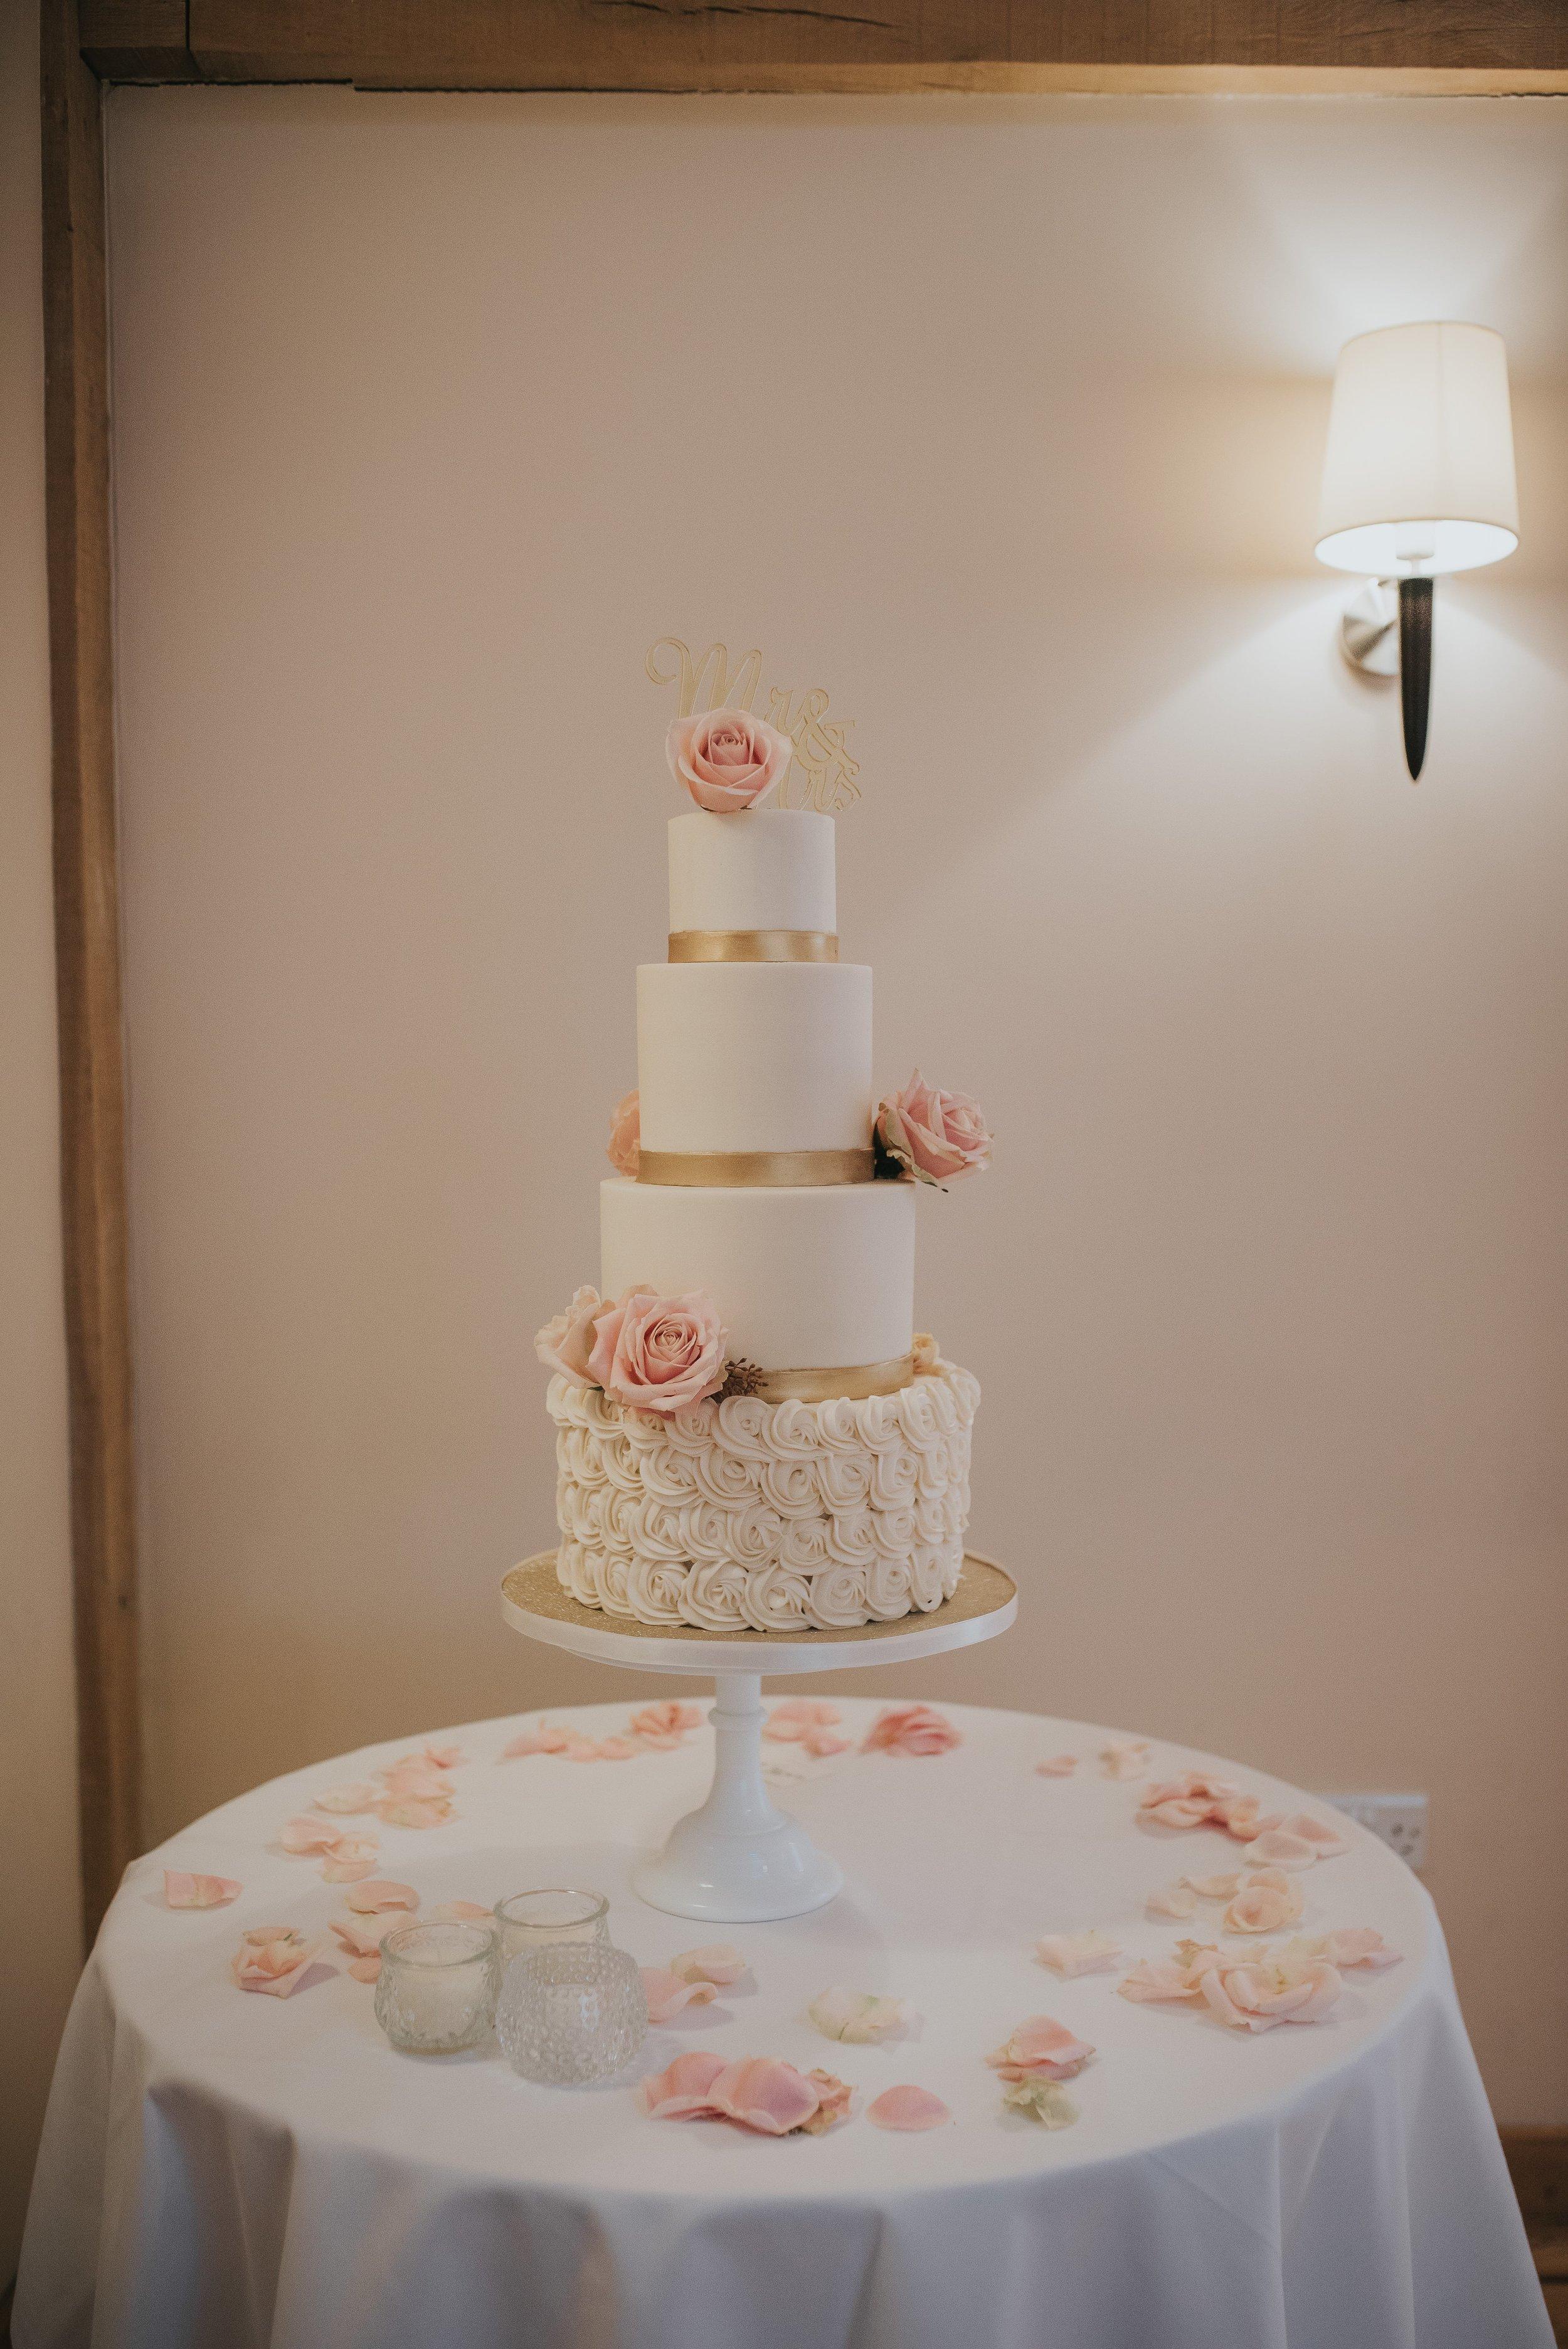 Bassmead manor barns wedding cake buttercream rosettes st neots